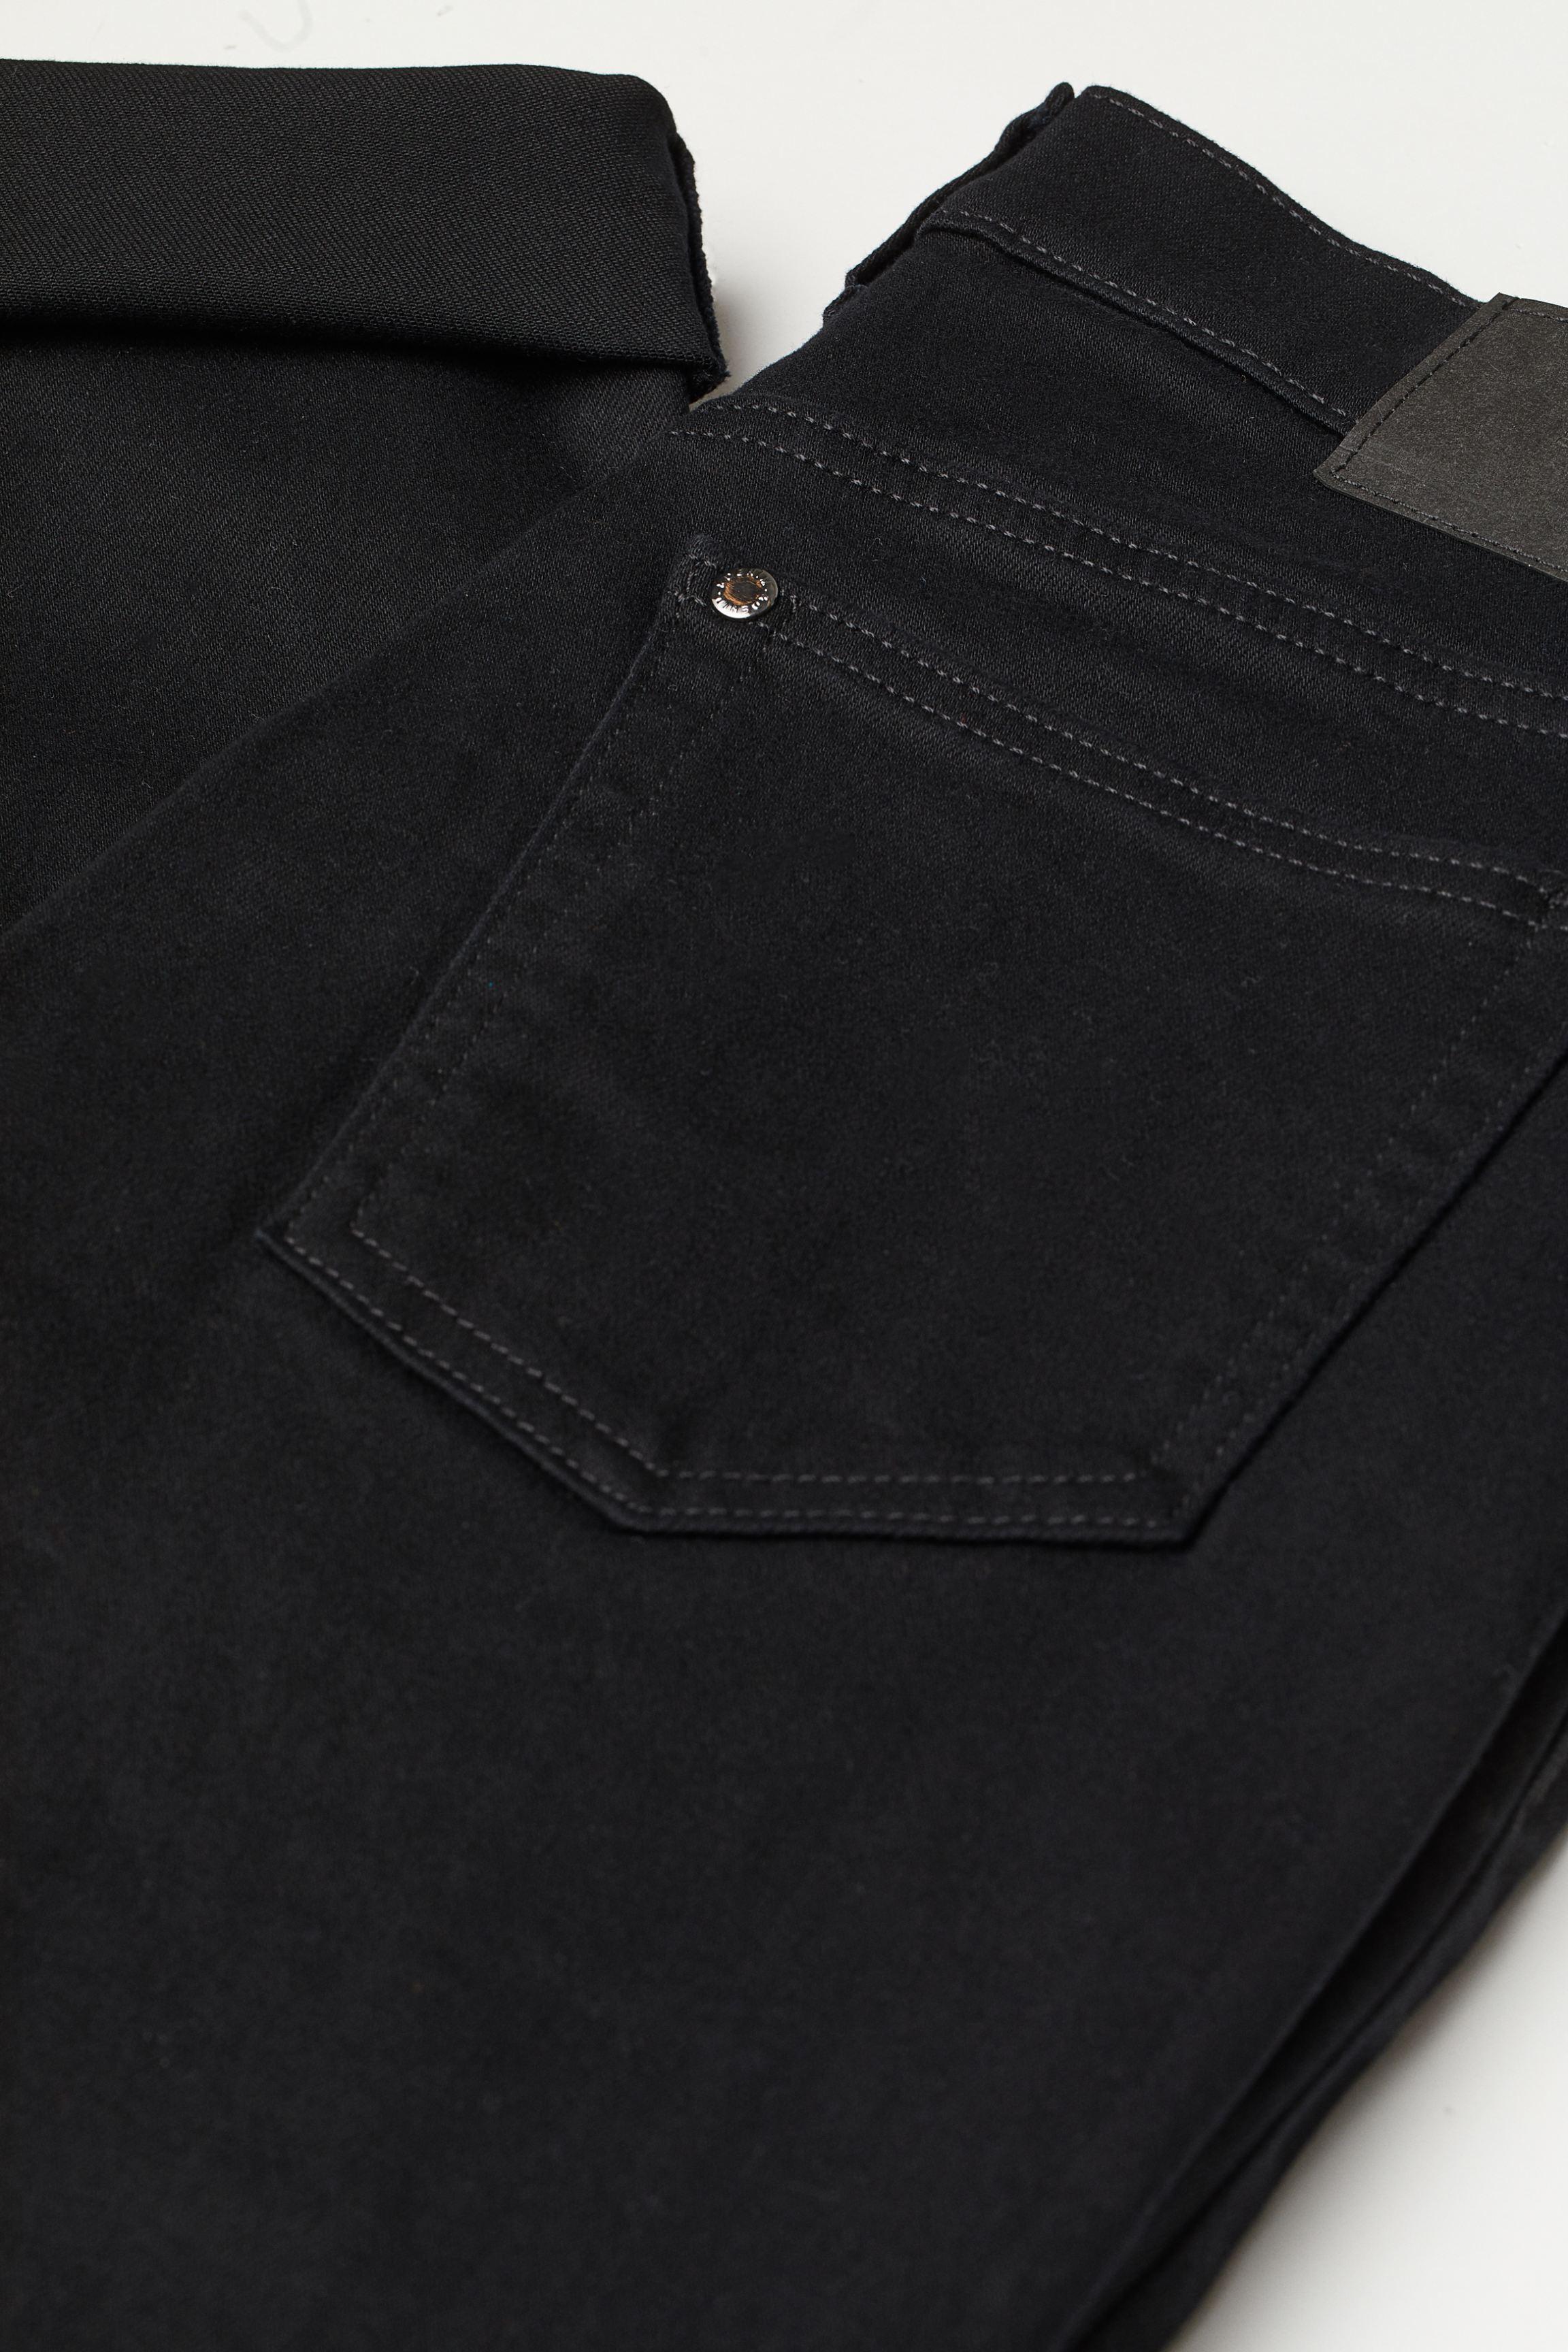 Skinny No Fade Black Jeans